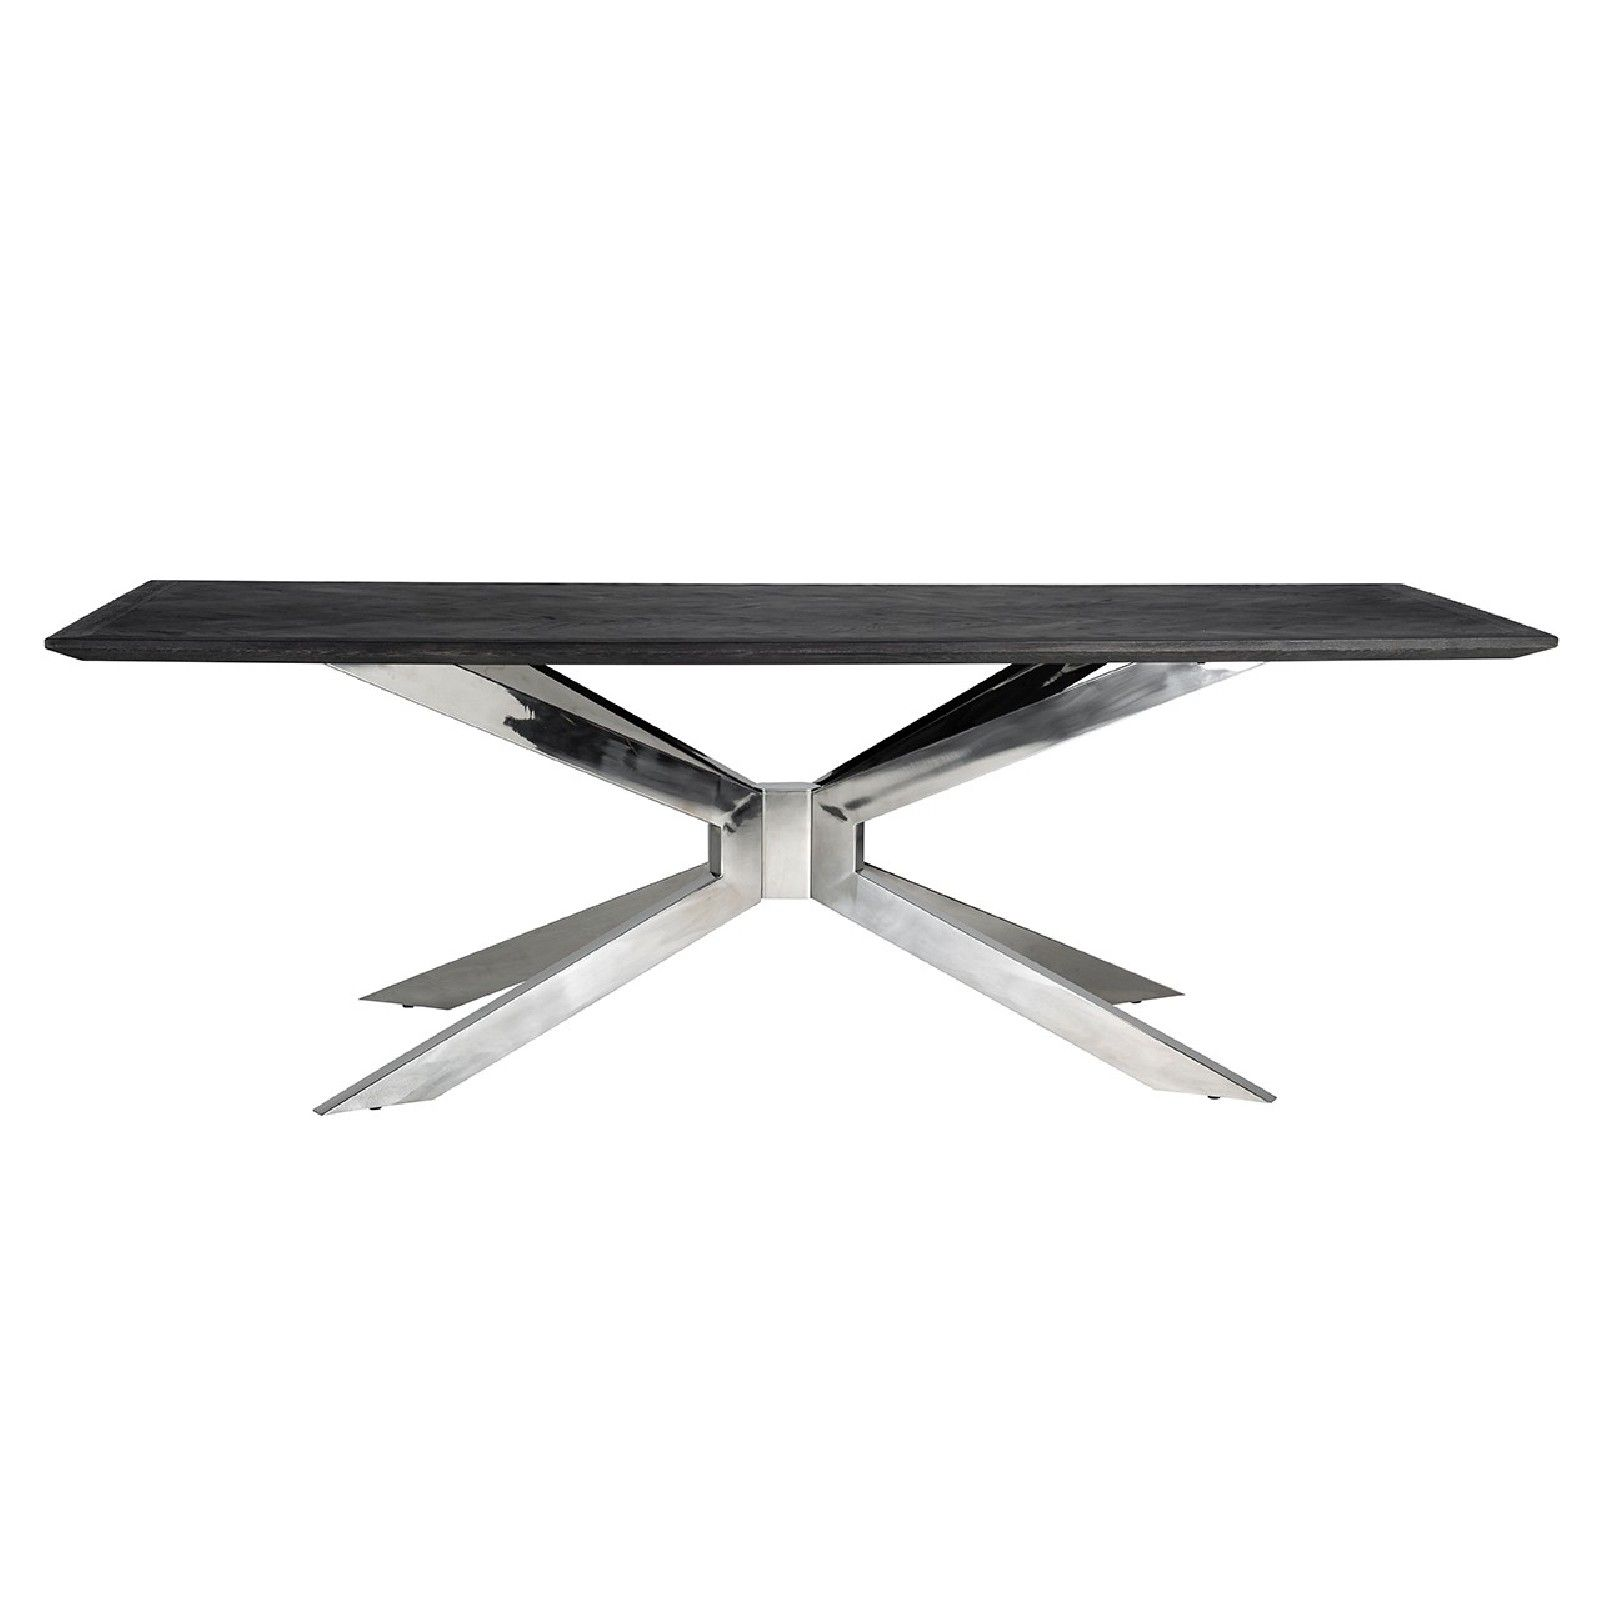 Table à dîner Blackbone Matrix silver 200x100 Meuble Déco Tendance - 406